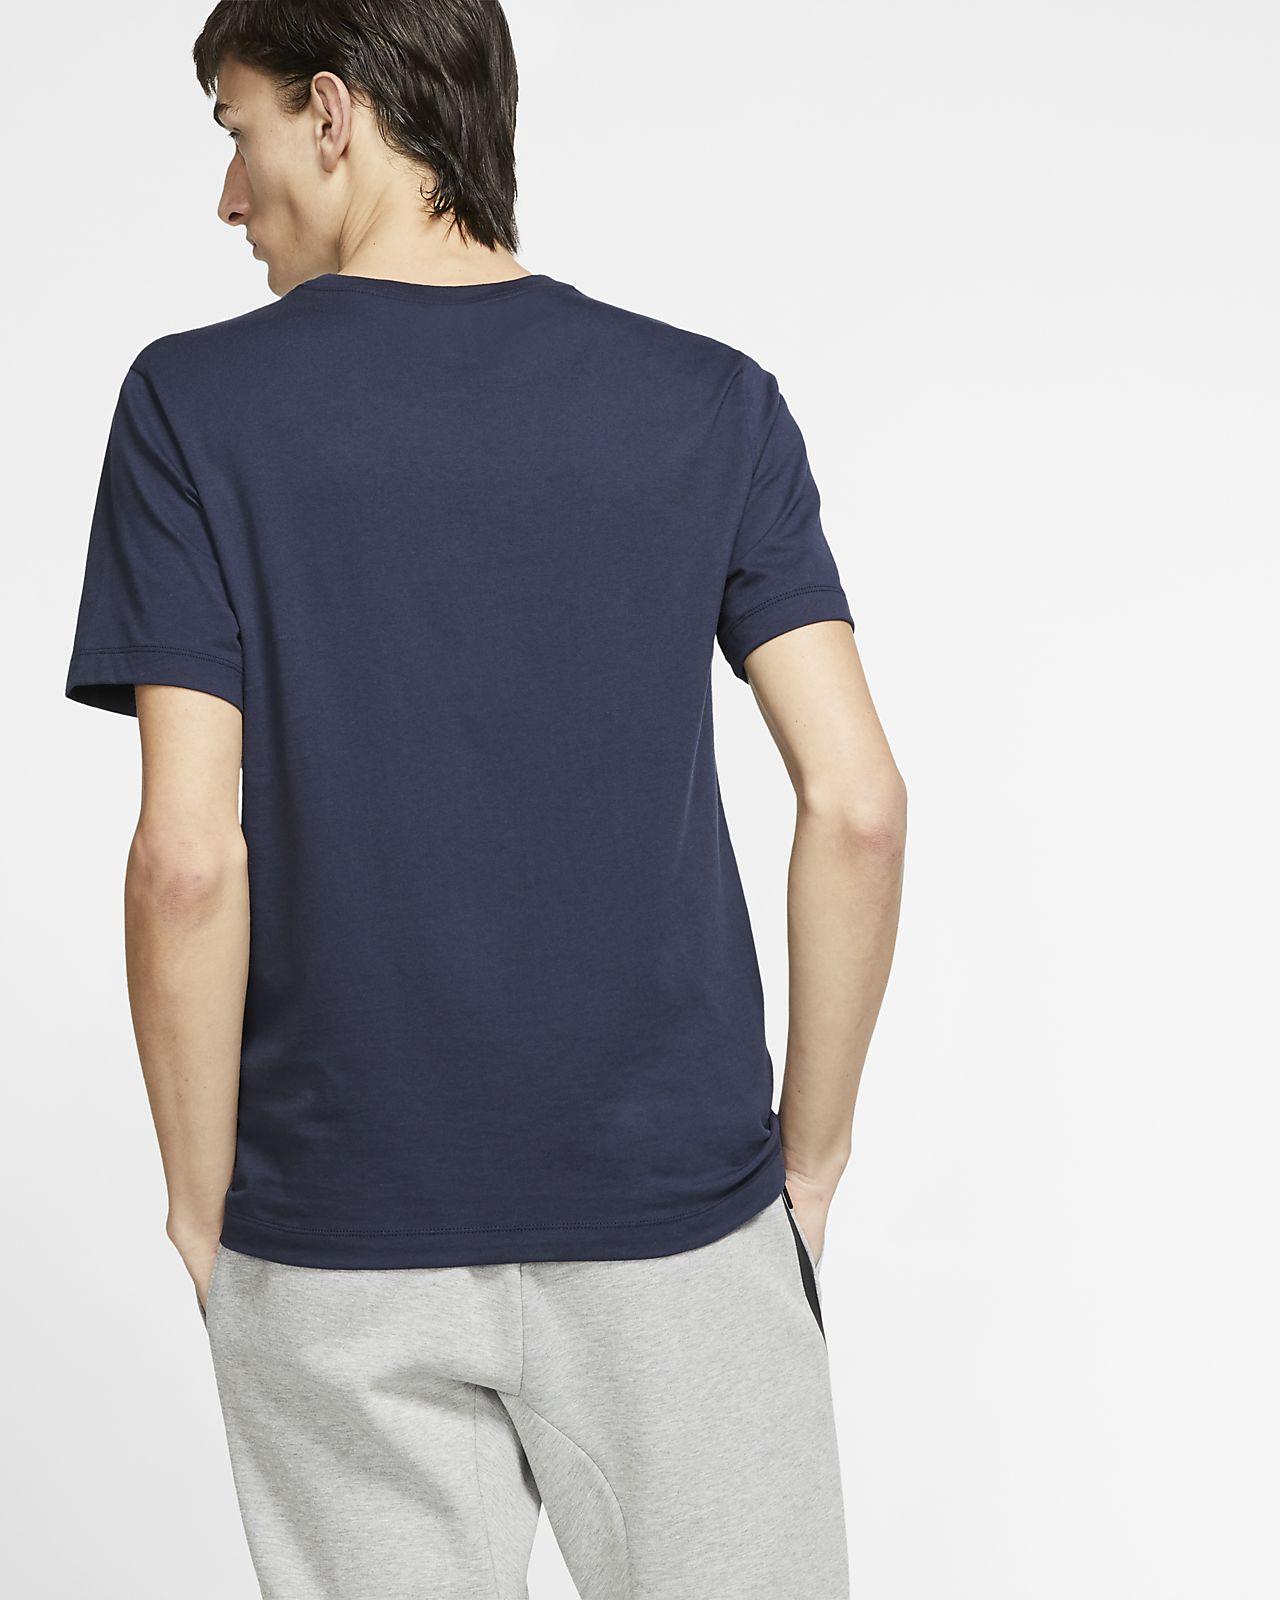 7b1a3a6e31213e Nike Sportswear Men s T-Shirt. Nike.com ID